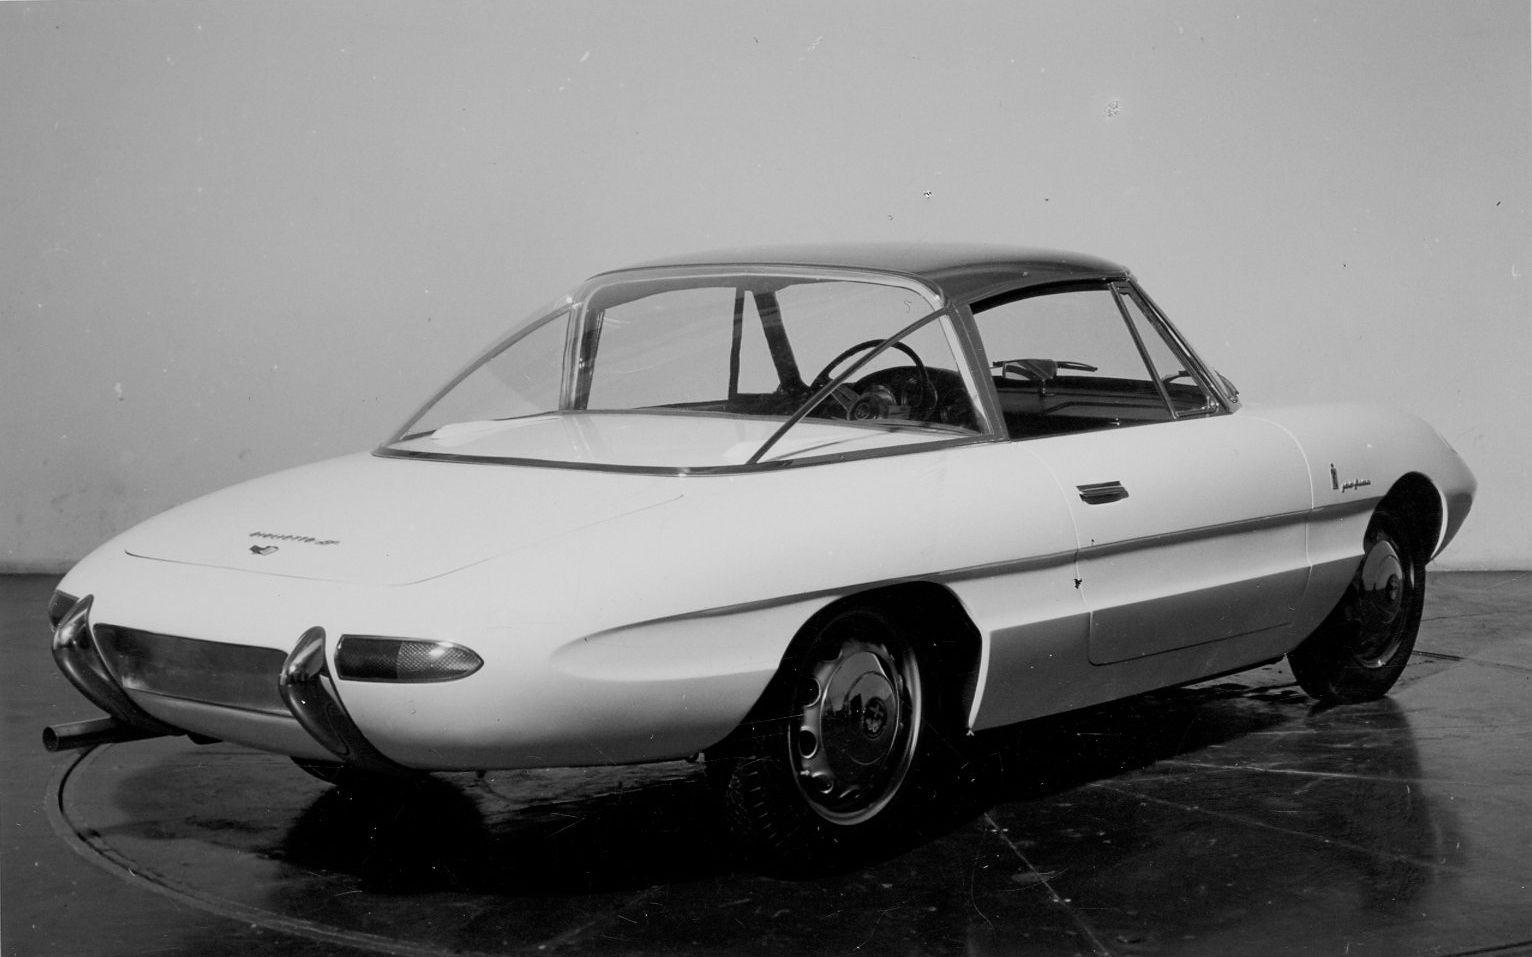 1962-Alfa-Romeo-Giulietta-SS-Coupe-Speciale-Aerodinamica-02